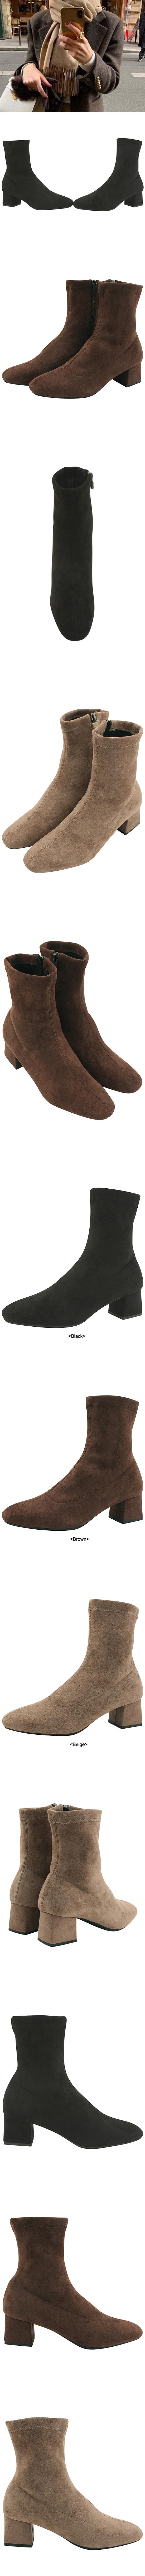 Suede socks middle heel ankle boots beige